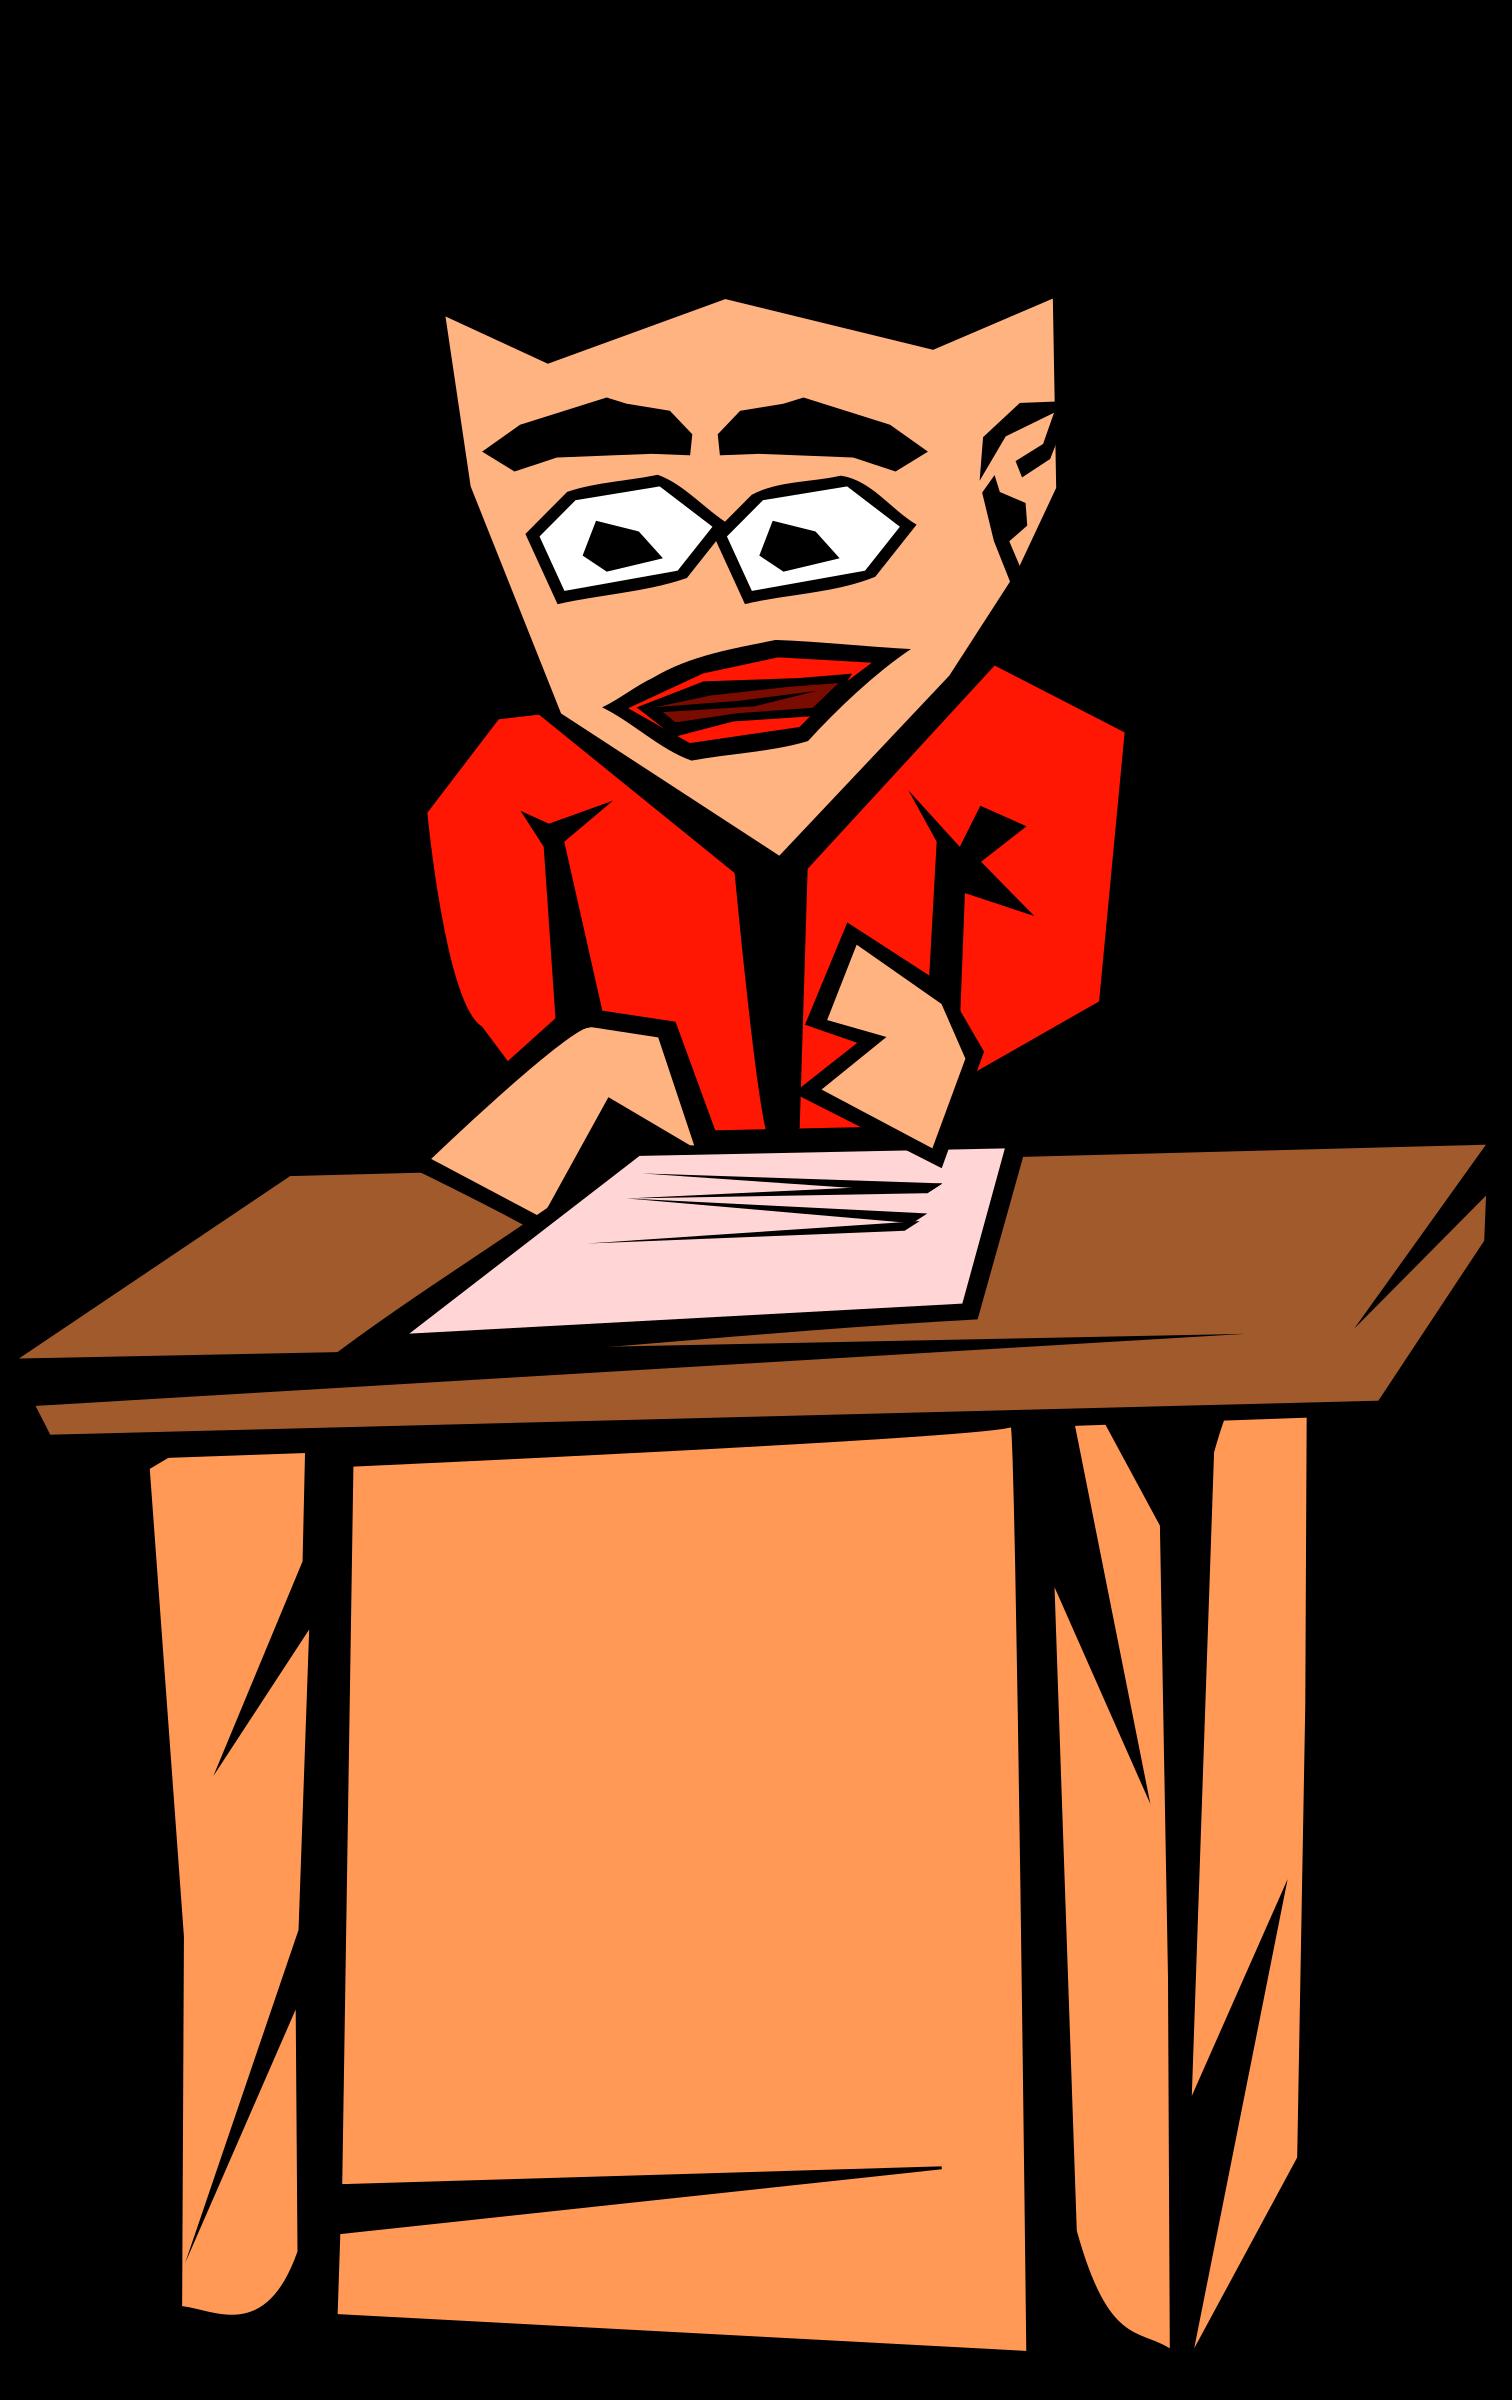 Desk clipart literature. Panic big image png